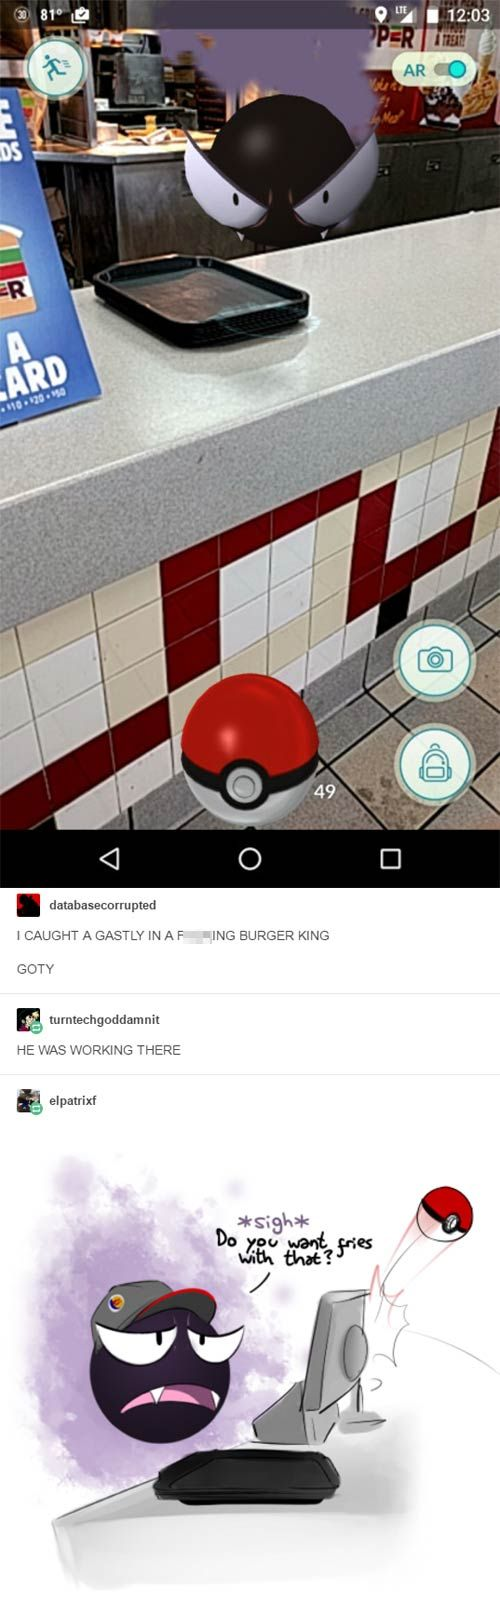 pokemon go funny gastly burger king